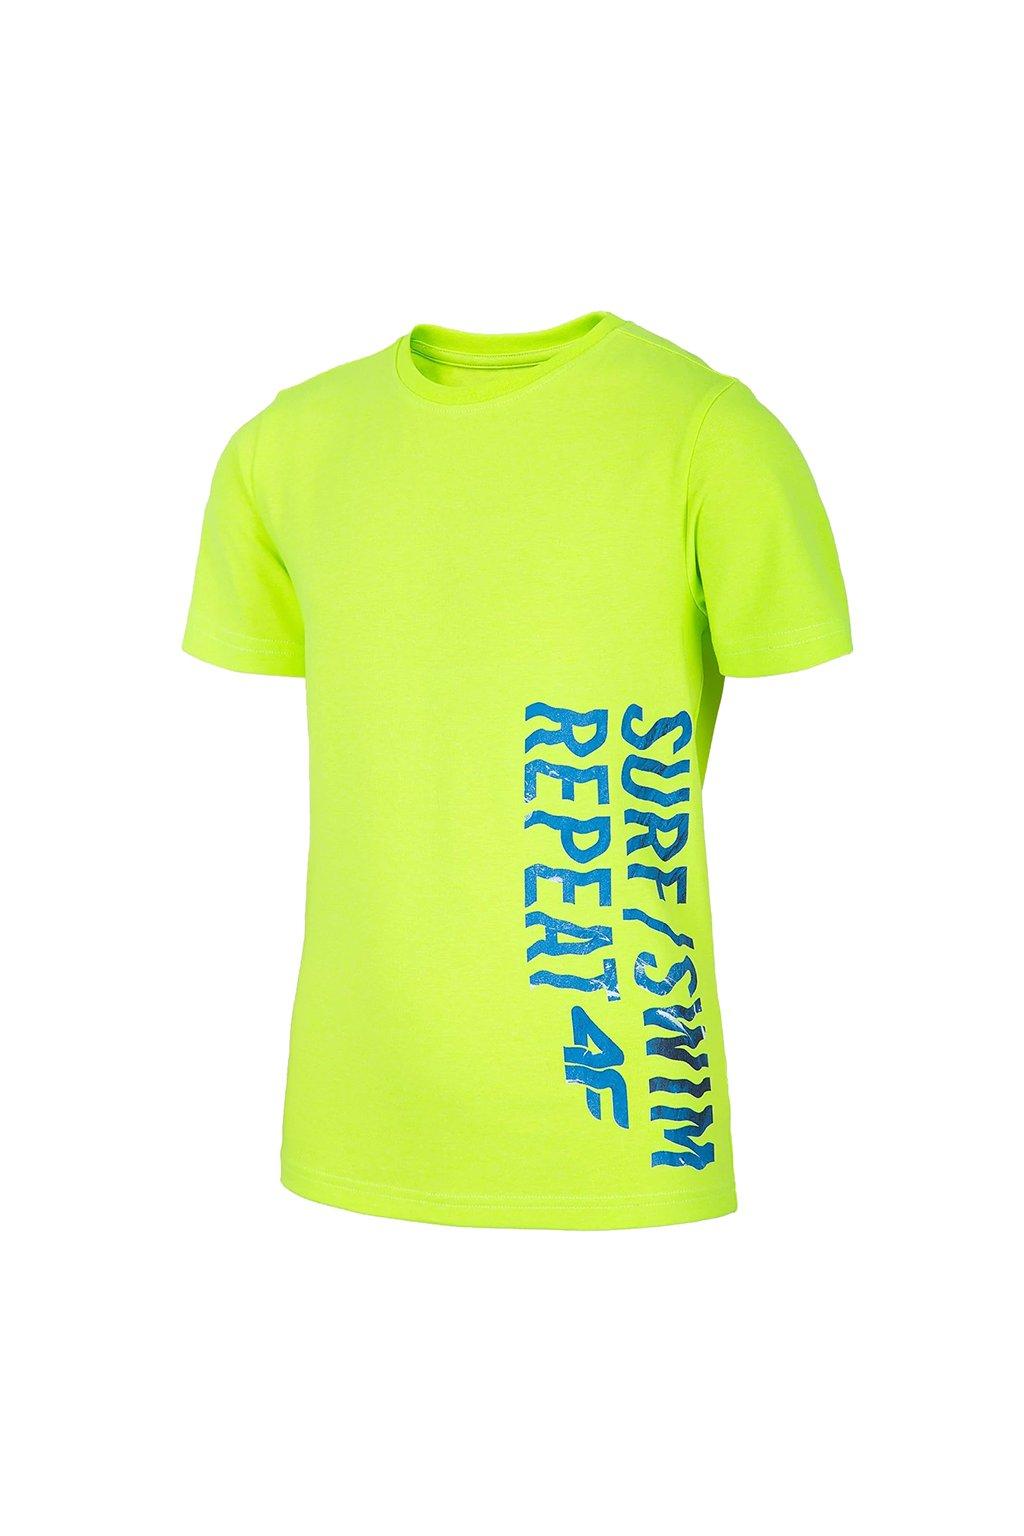 Chlapčenské tričko 4F limonka neon HJL20 JTSM016 72N